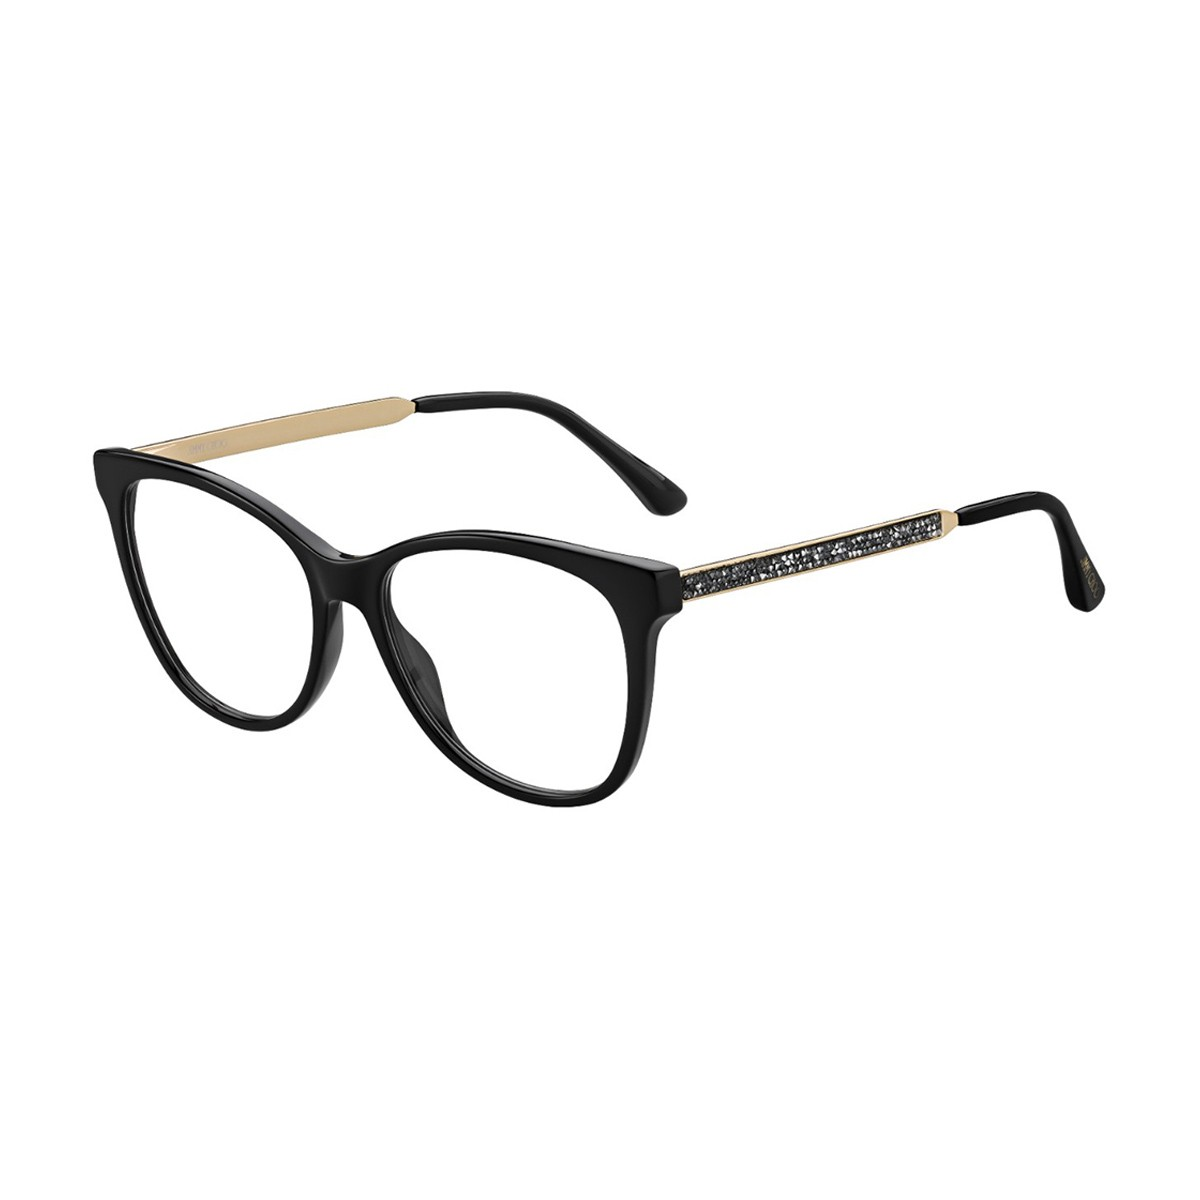 Jimmy Choo Jc199 | Women's eyeglasses